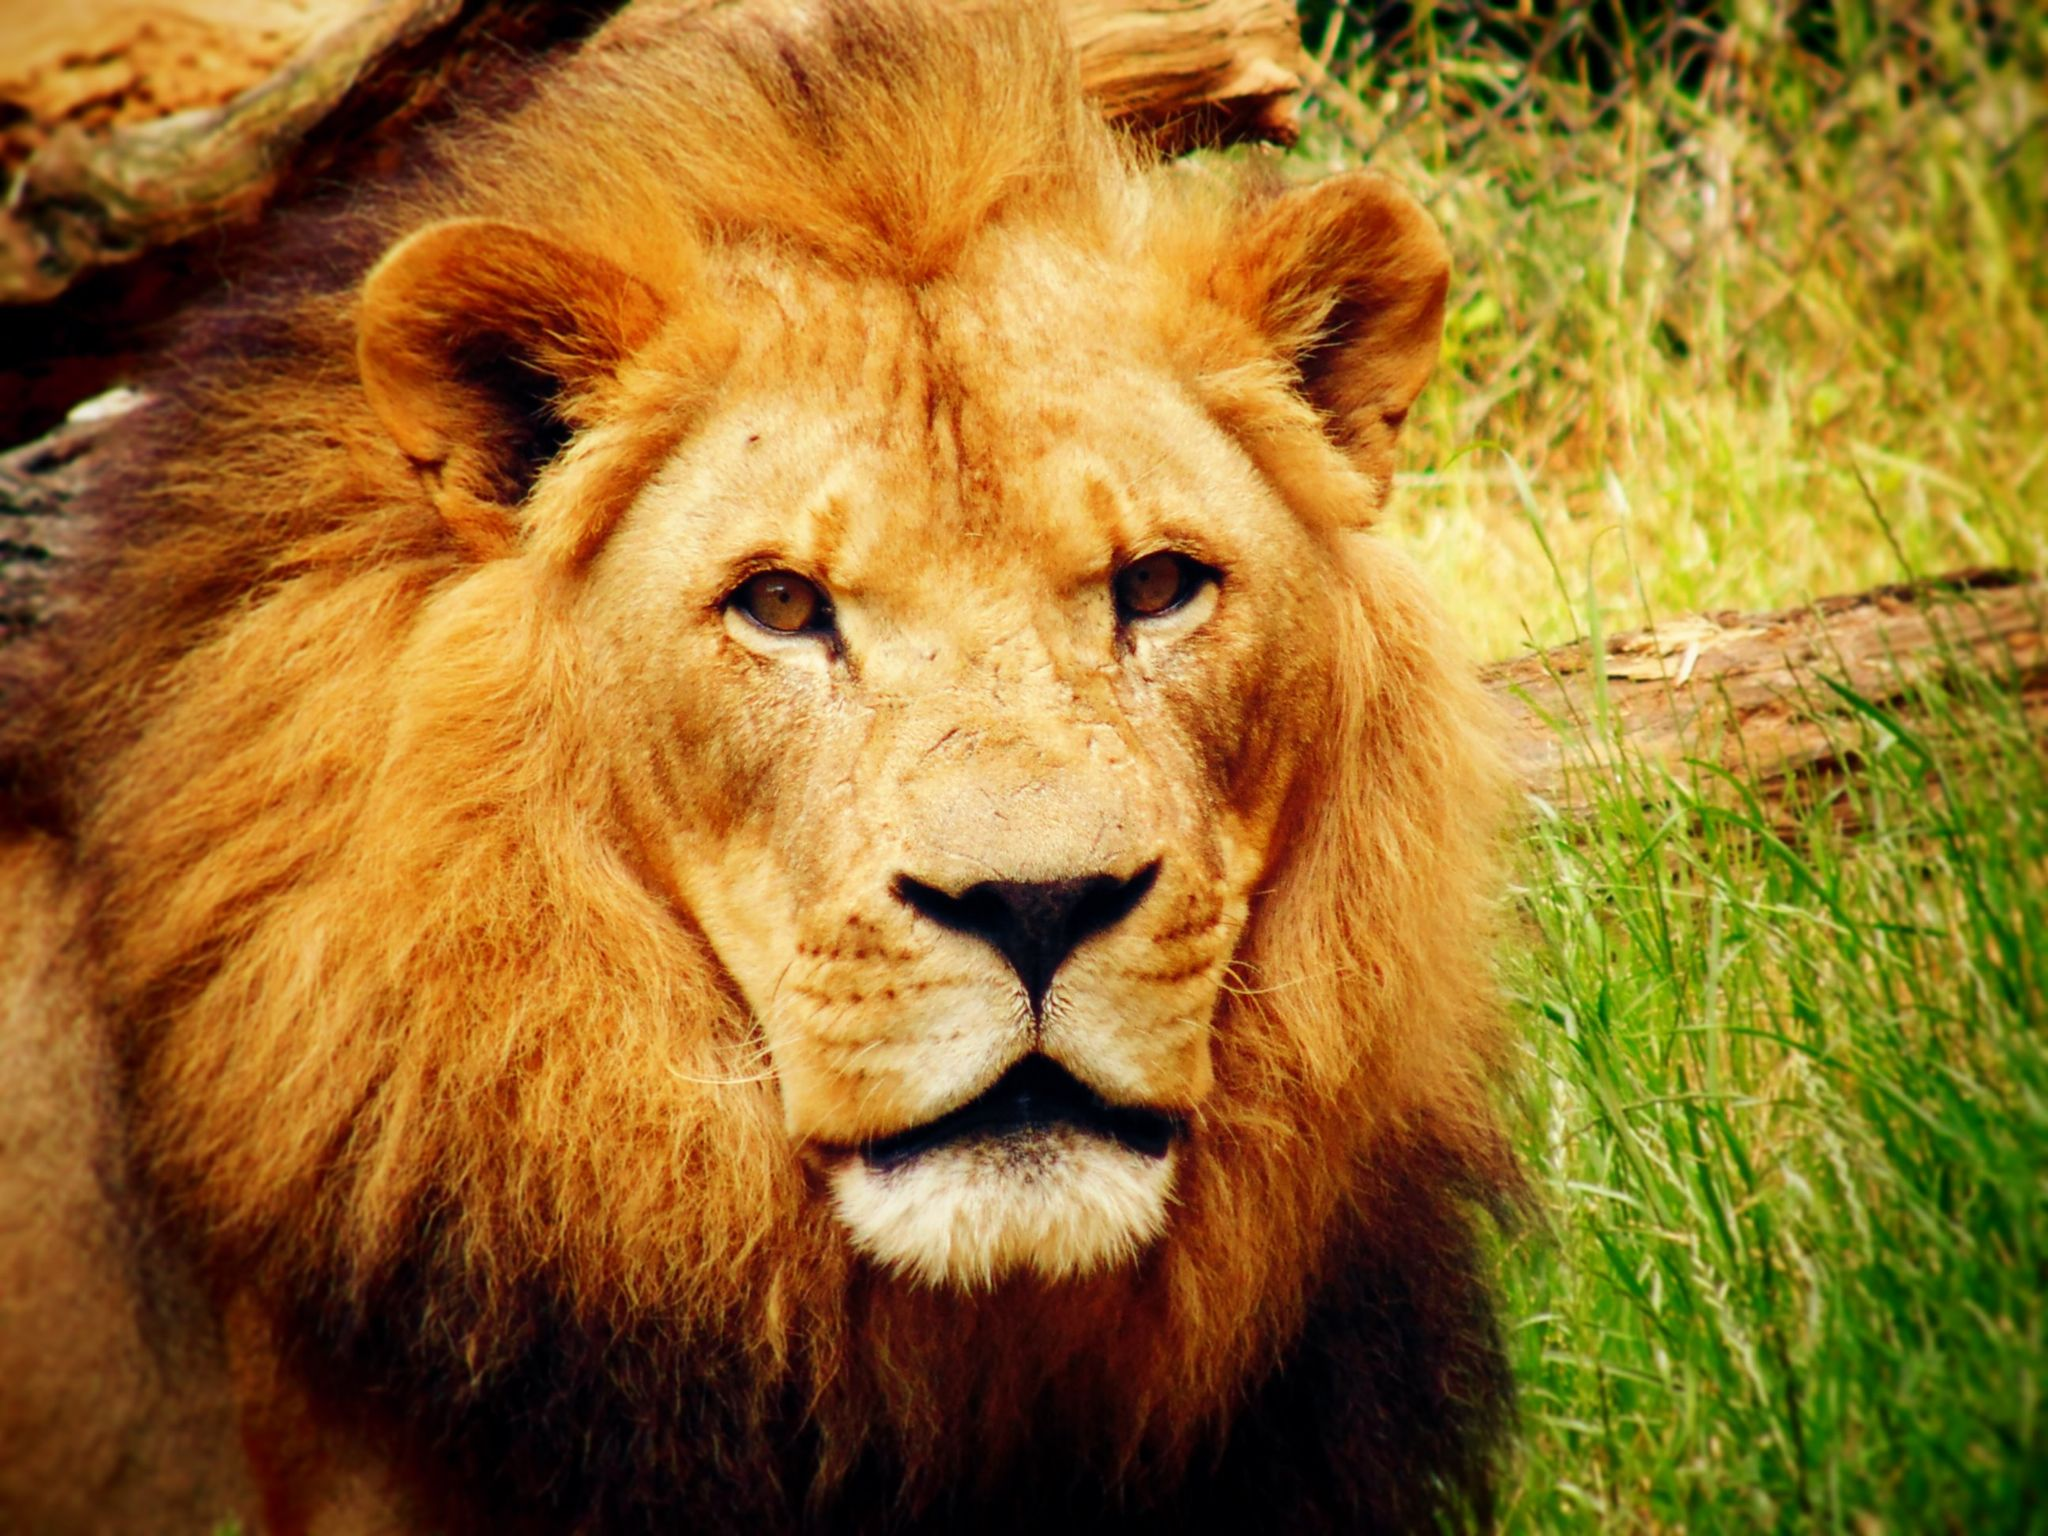 SuuZPhotography - Lion by SuuZPhotography